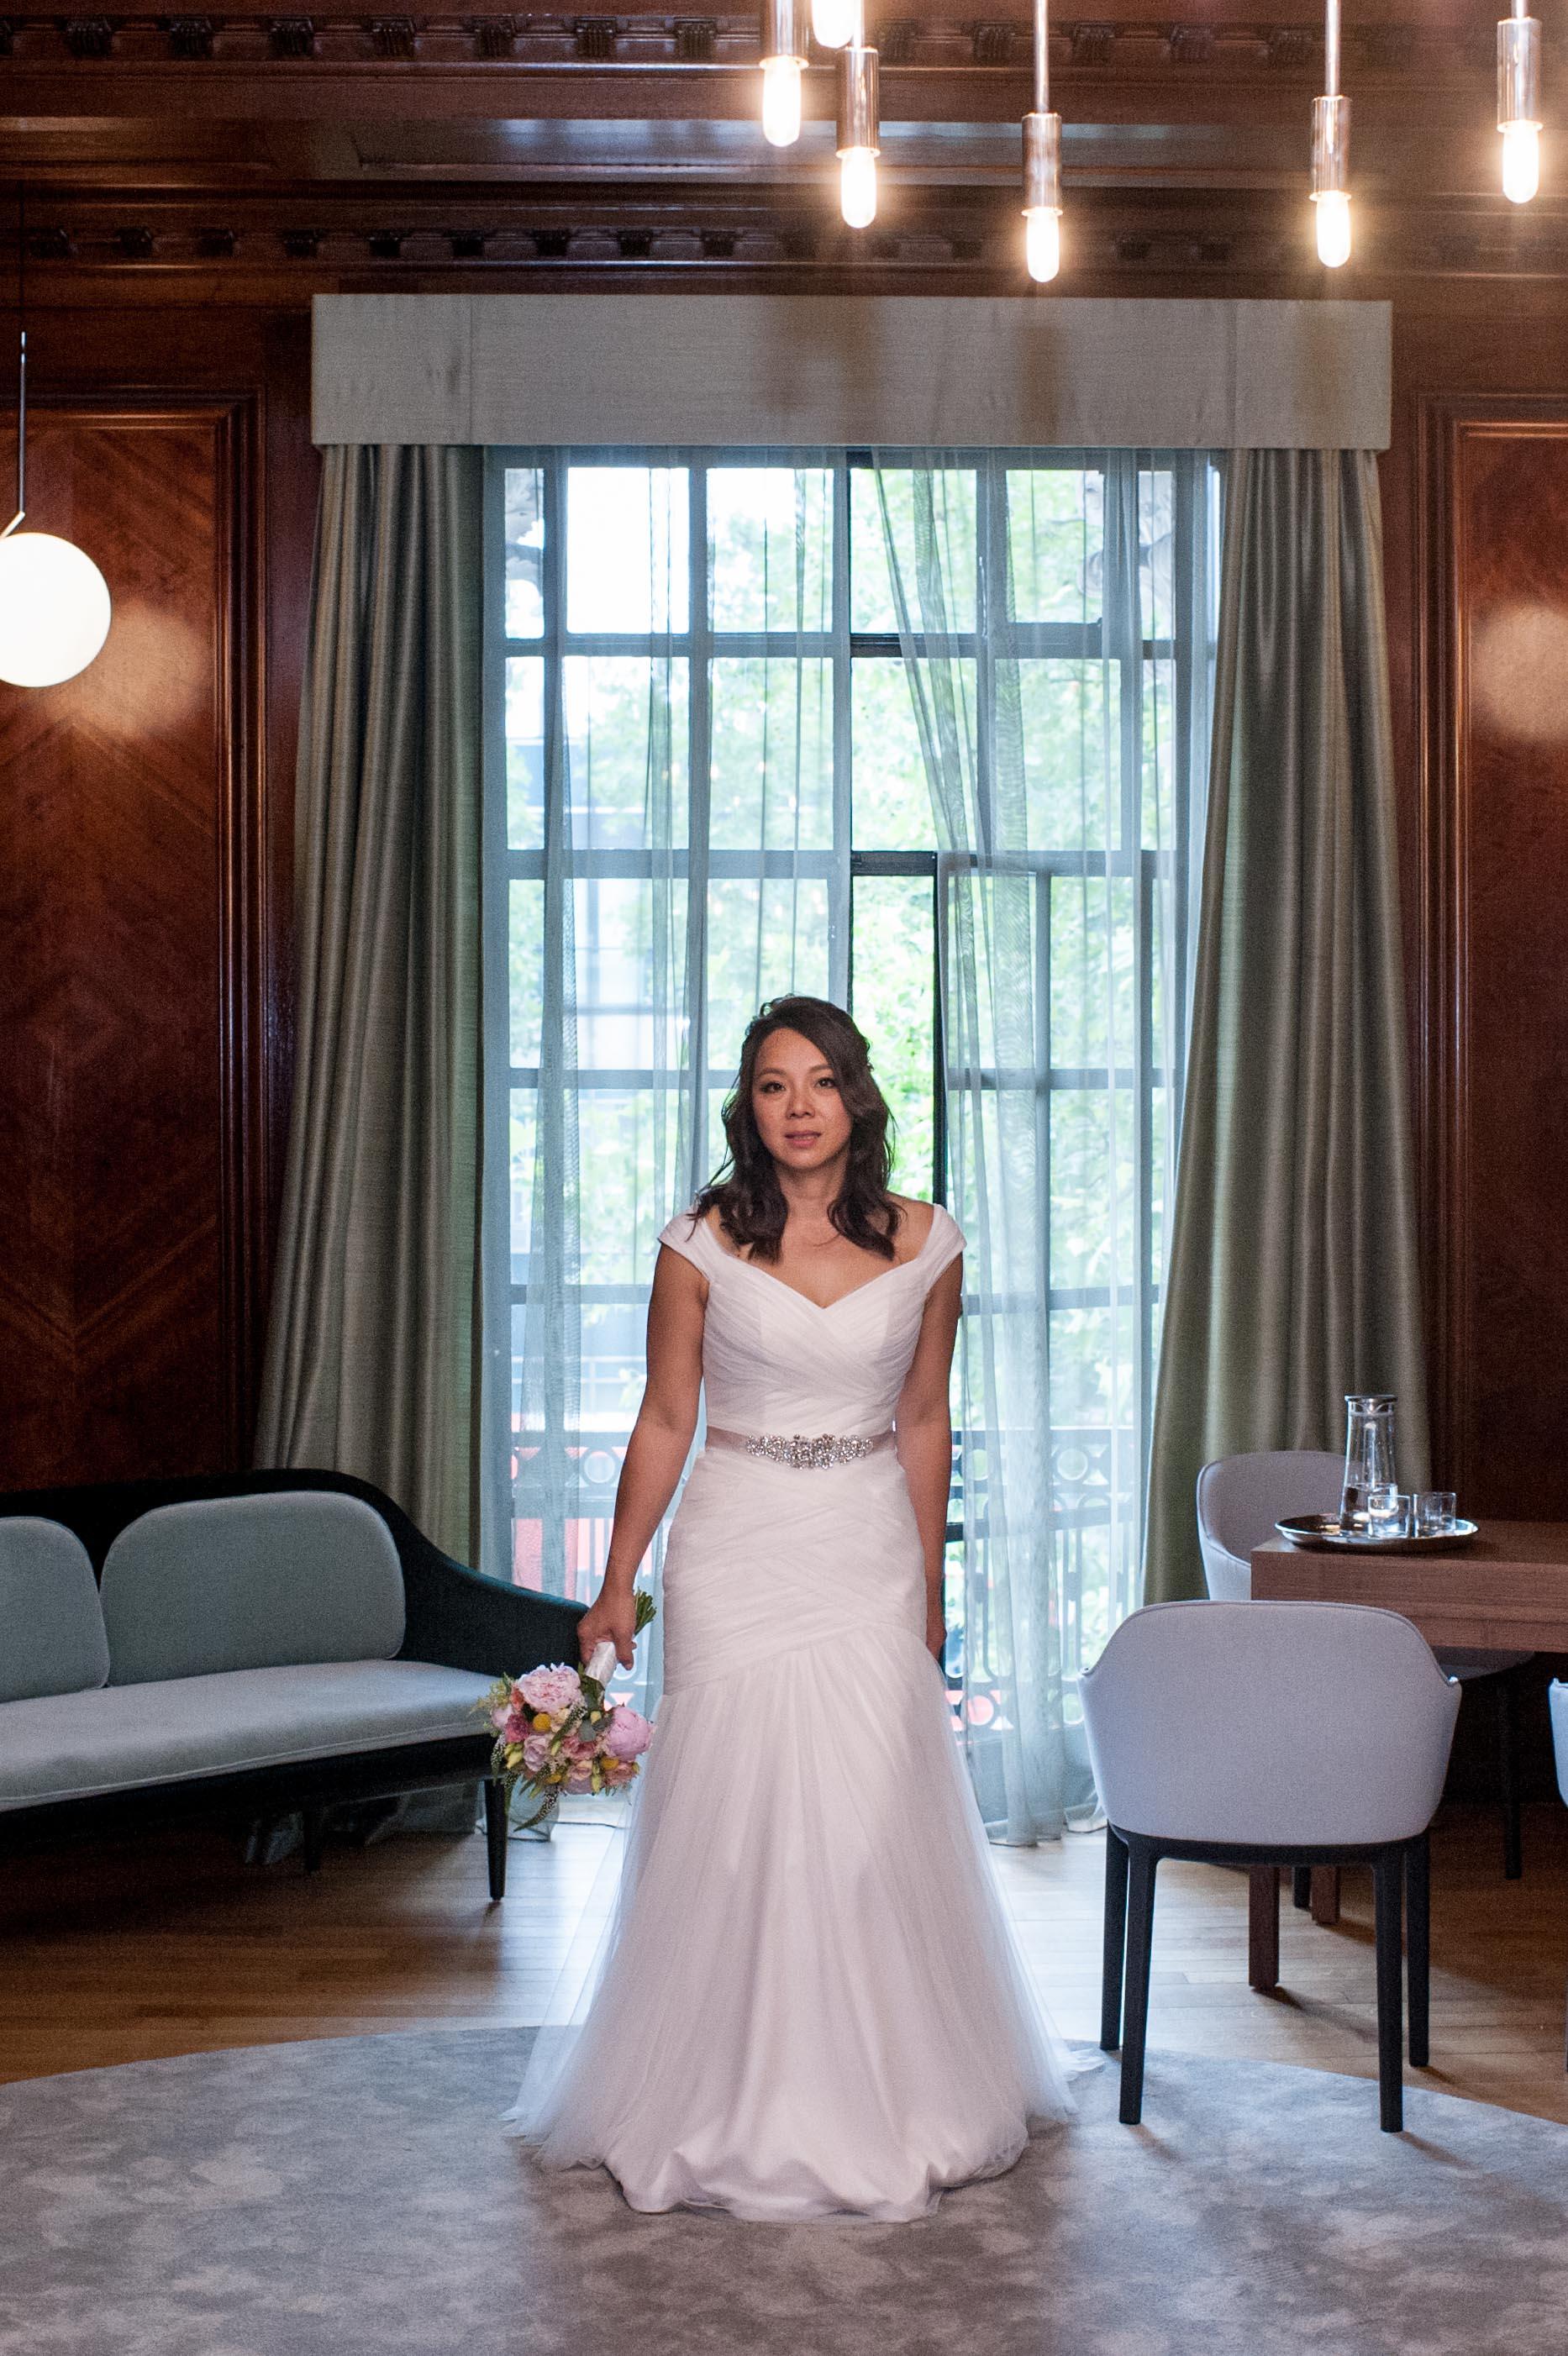 D&M_Marylebone Town Hall Wedding (76 of 239).jpg